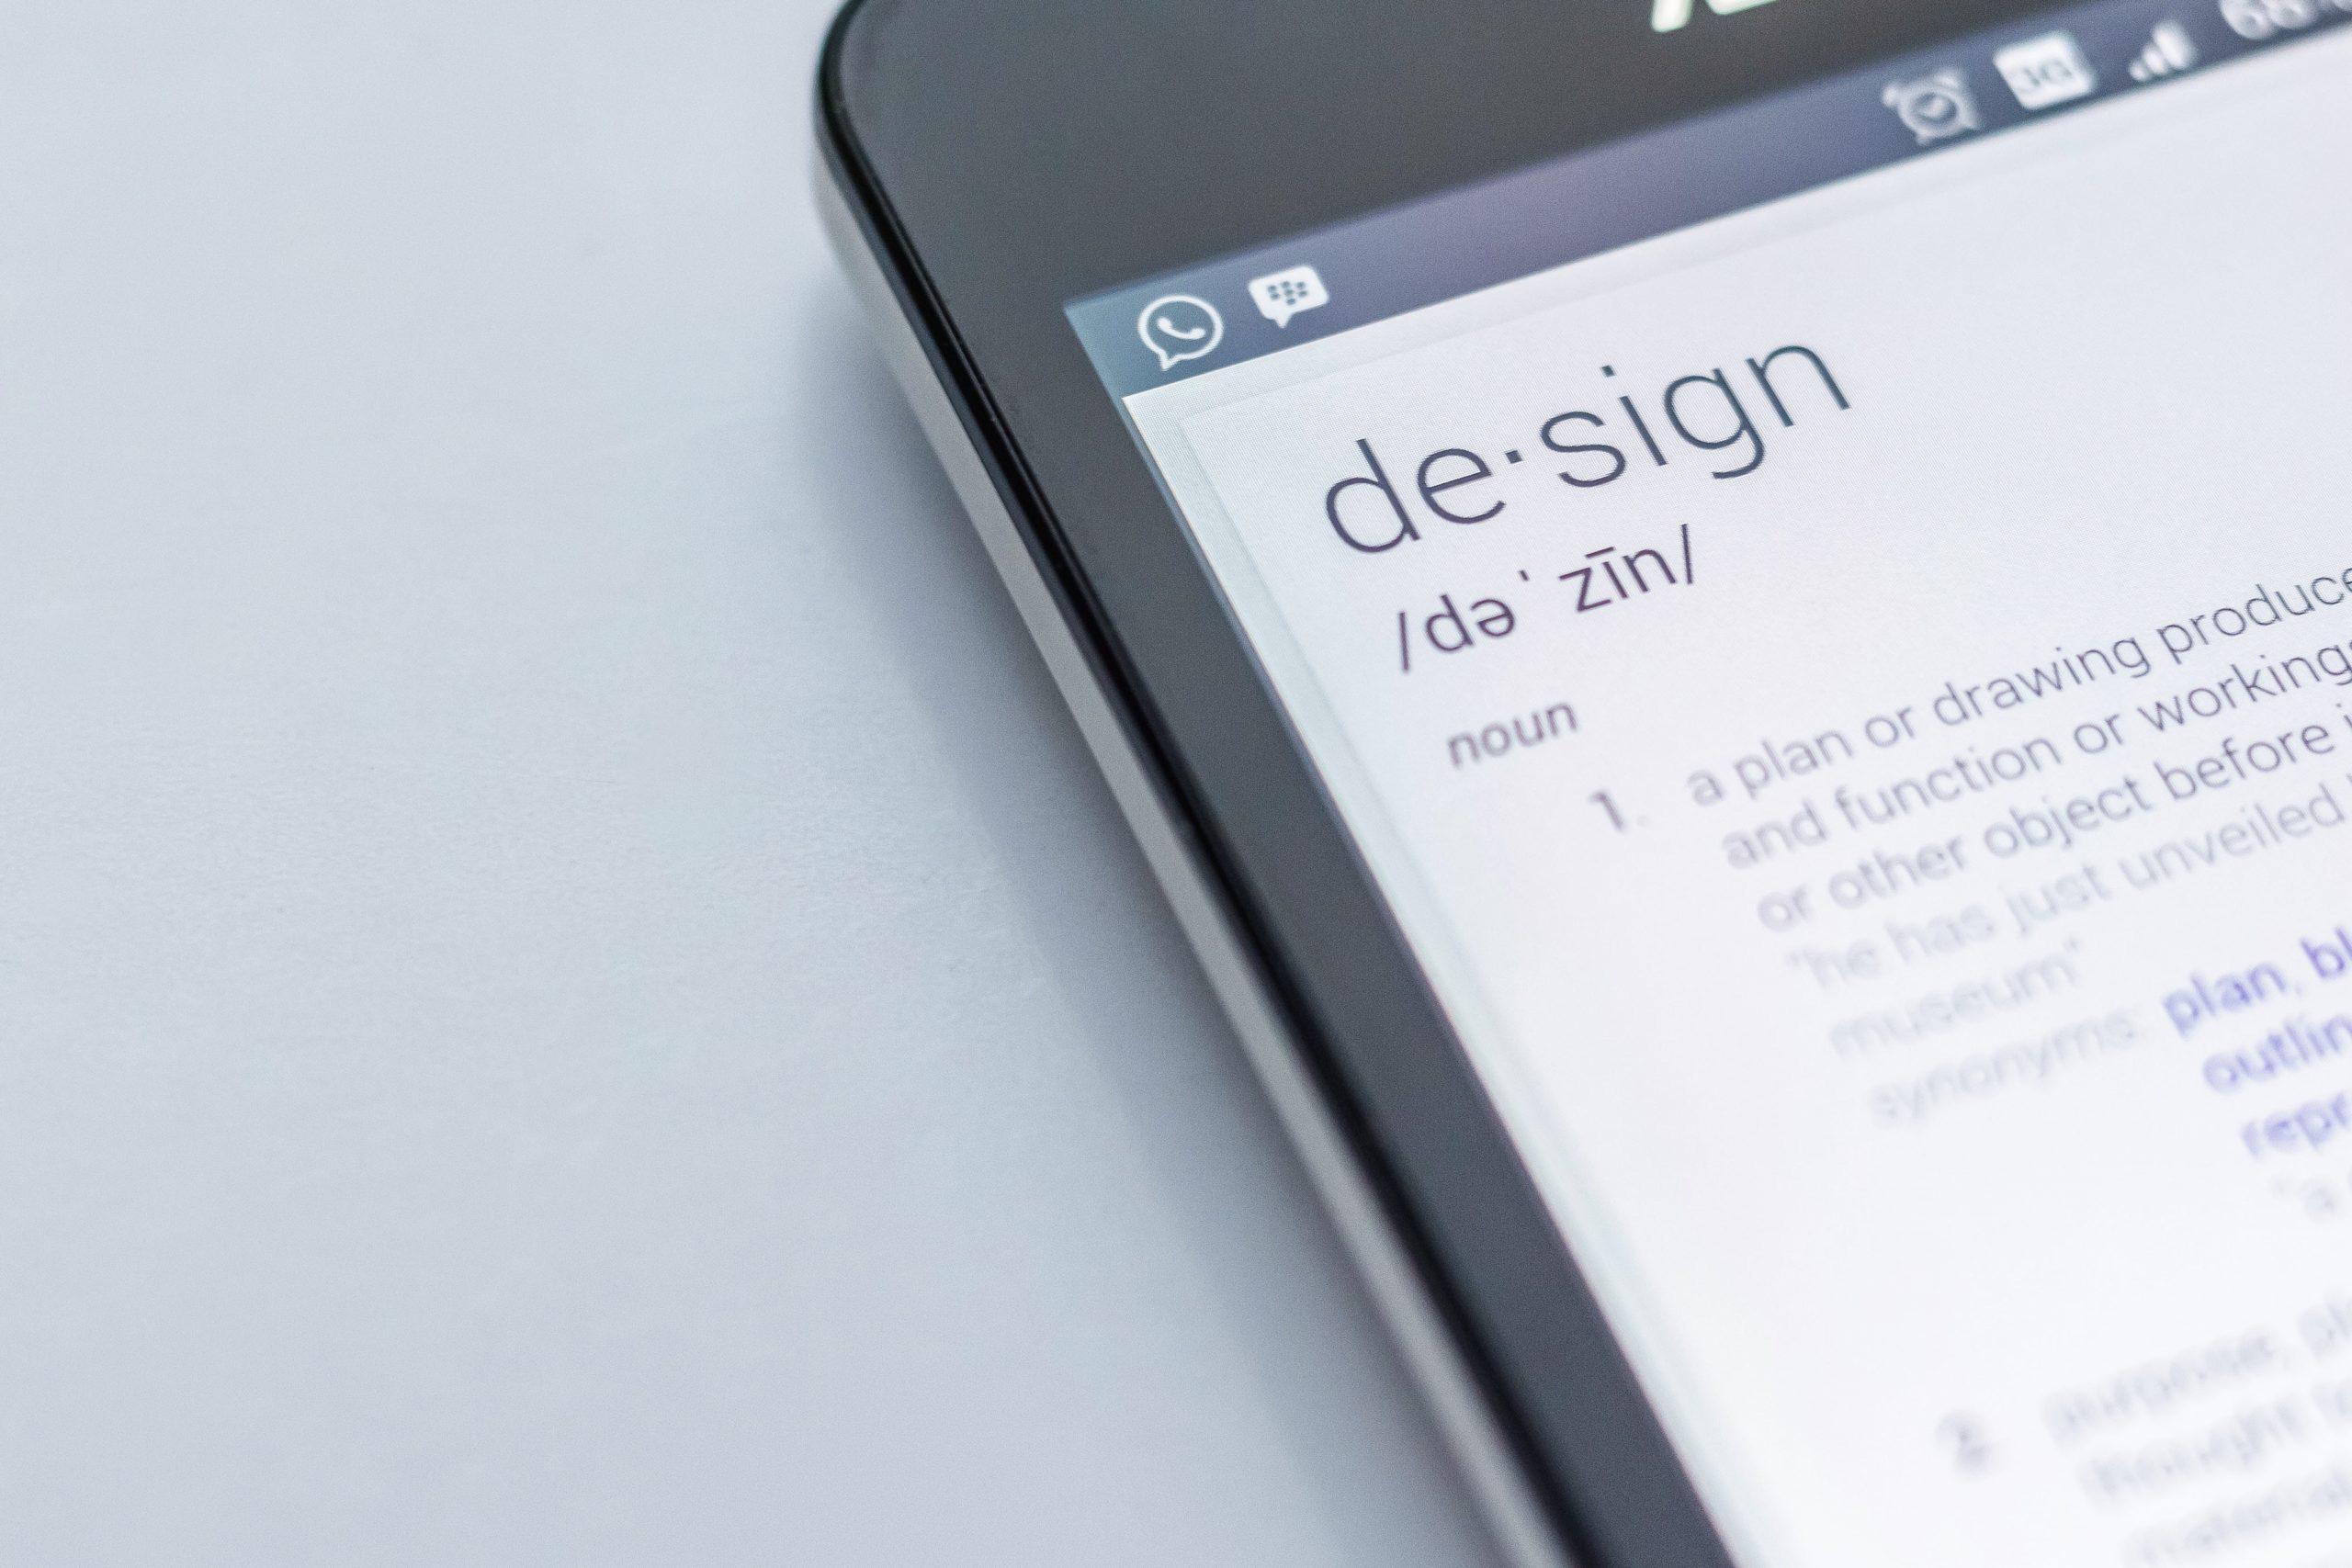 edho pratama T6fDN60bMWY unsplash scaled - Design: The Most Basic Marketing Tactic